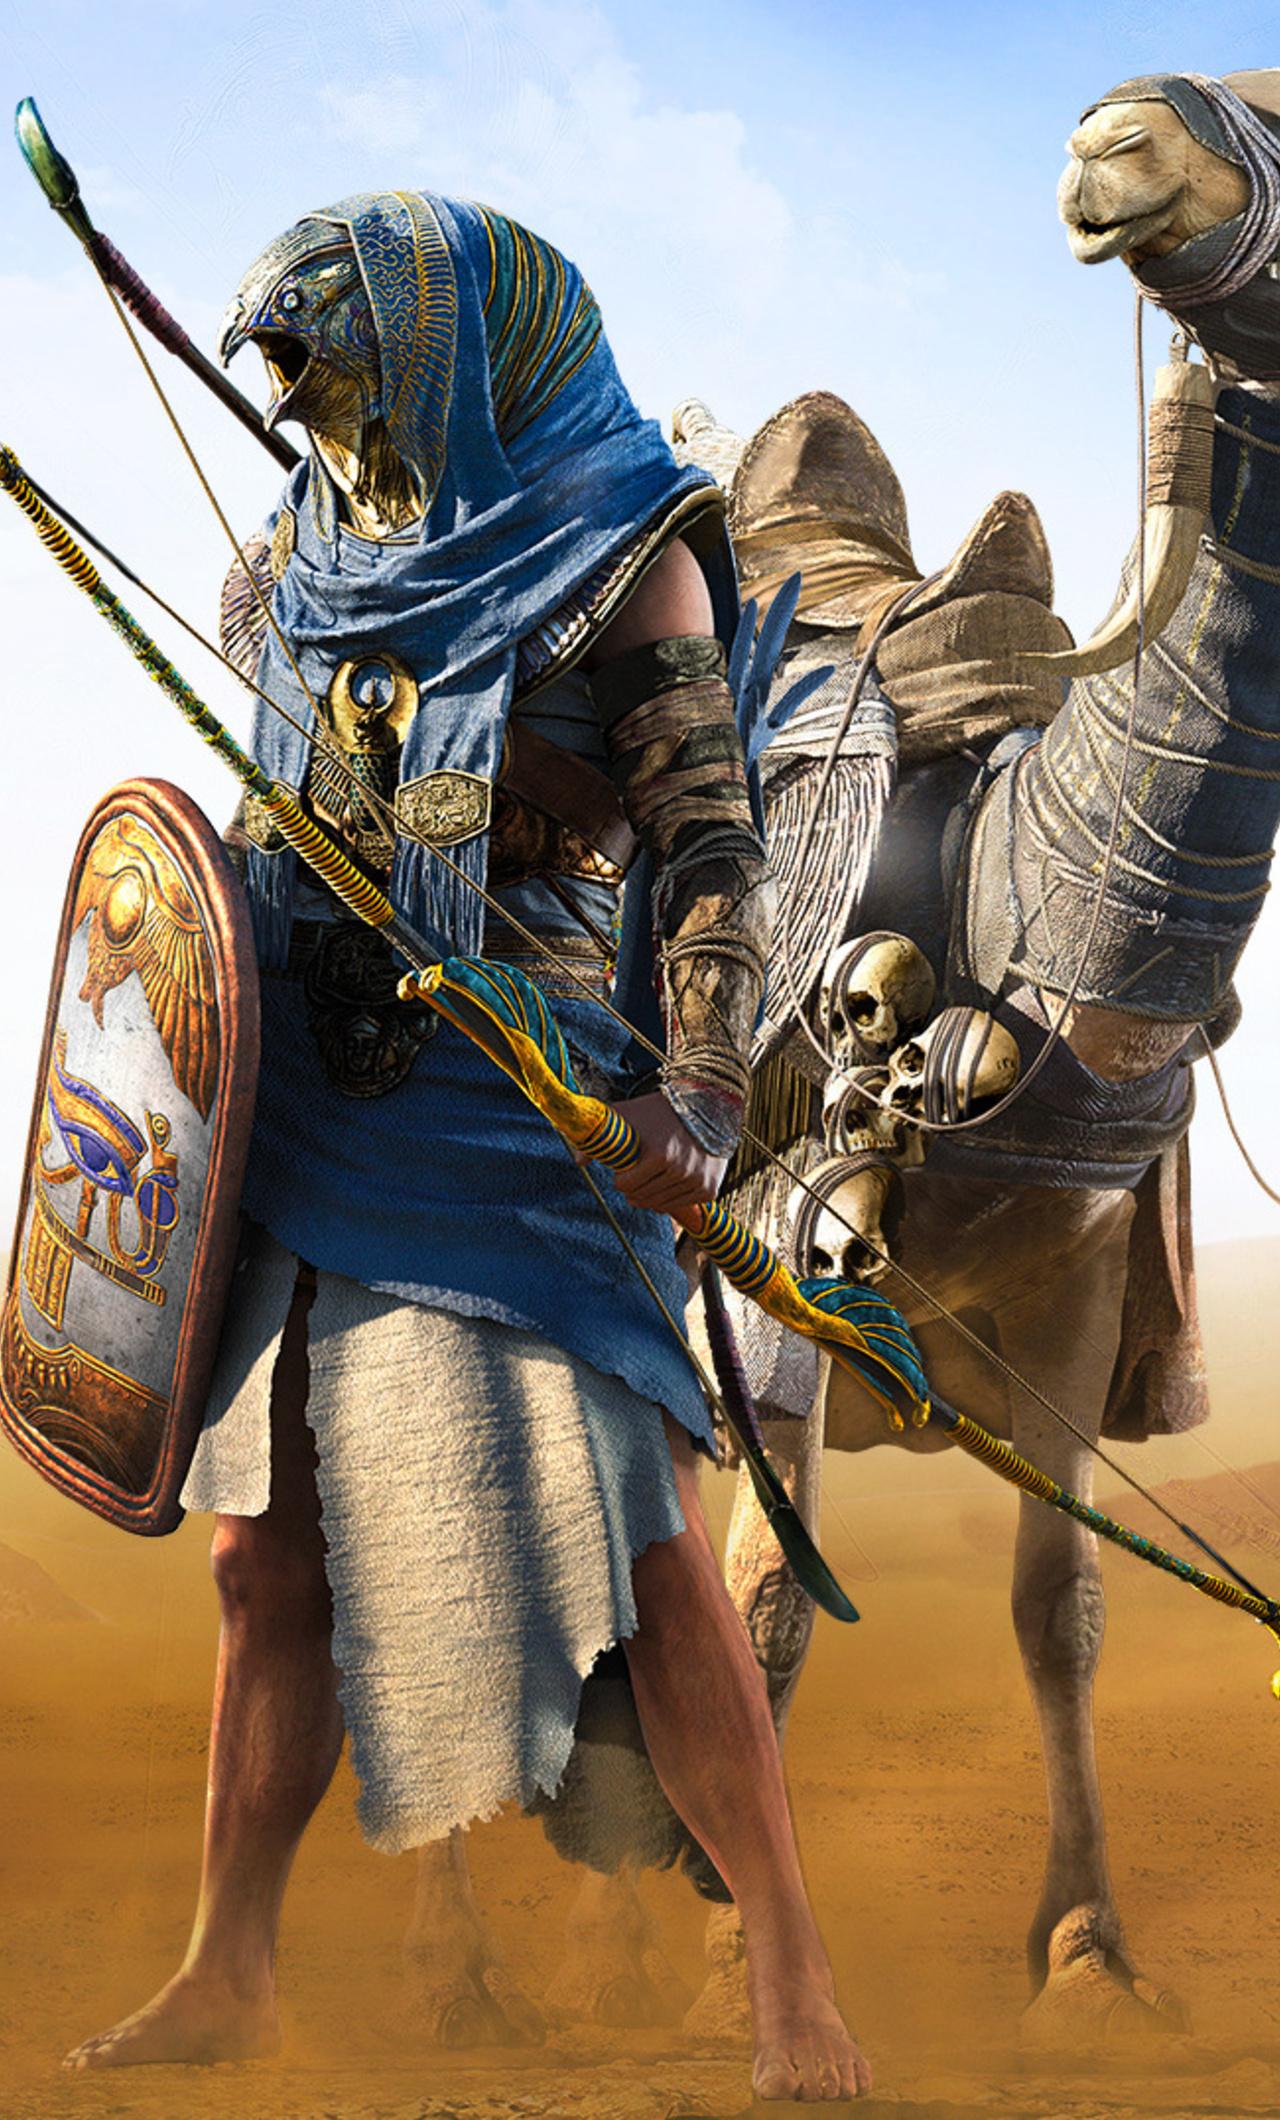 1280x2120 Horus Assassins Creed Origins Iphone 6 Hd 4k Wallpapers